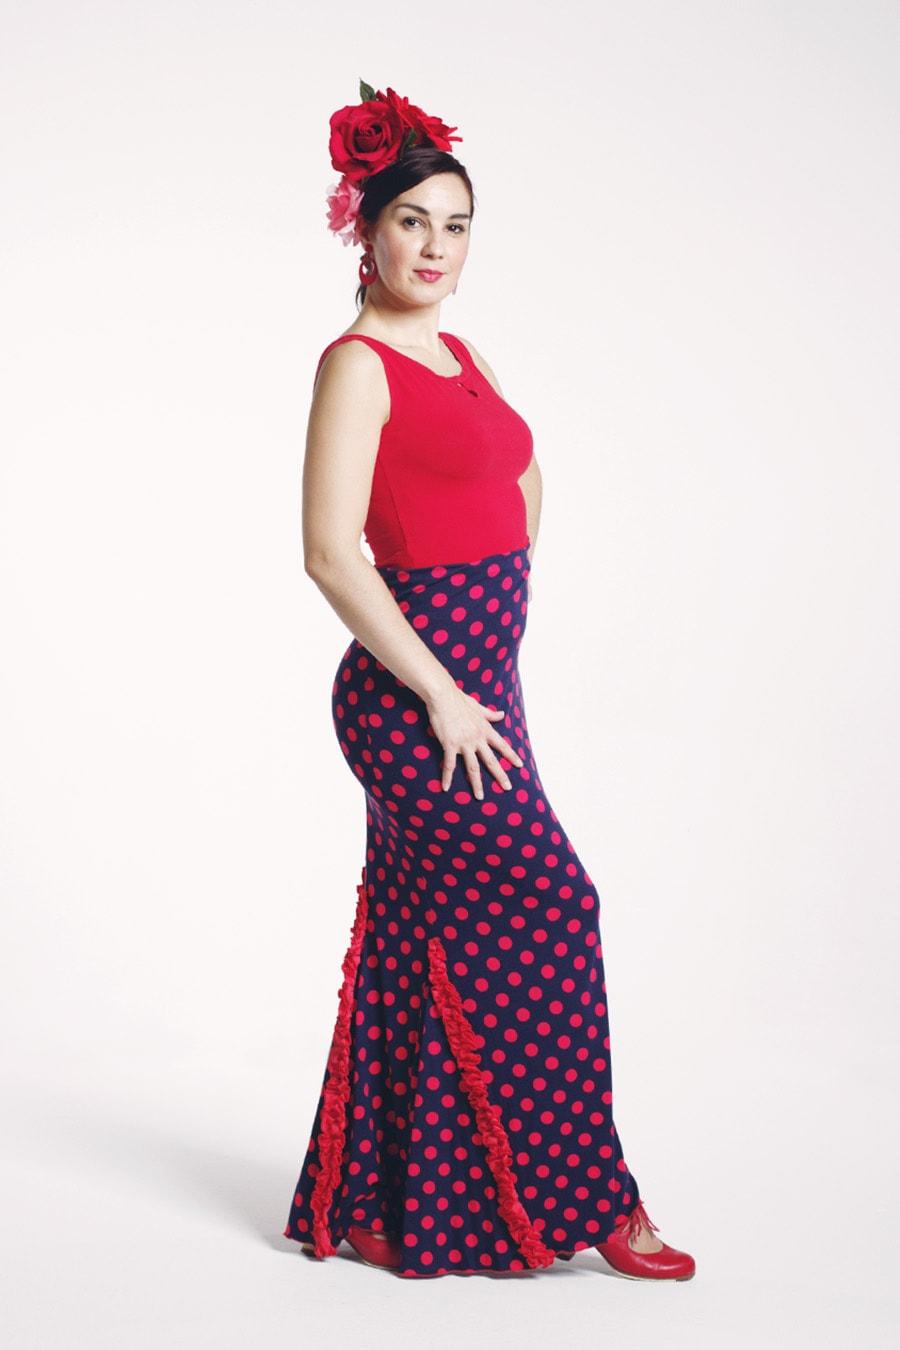 Flamenco skirt with half princess-cut in dark blue-red polka dot print